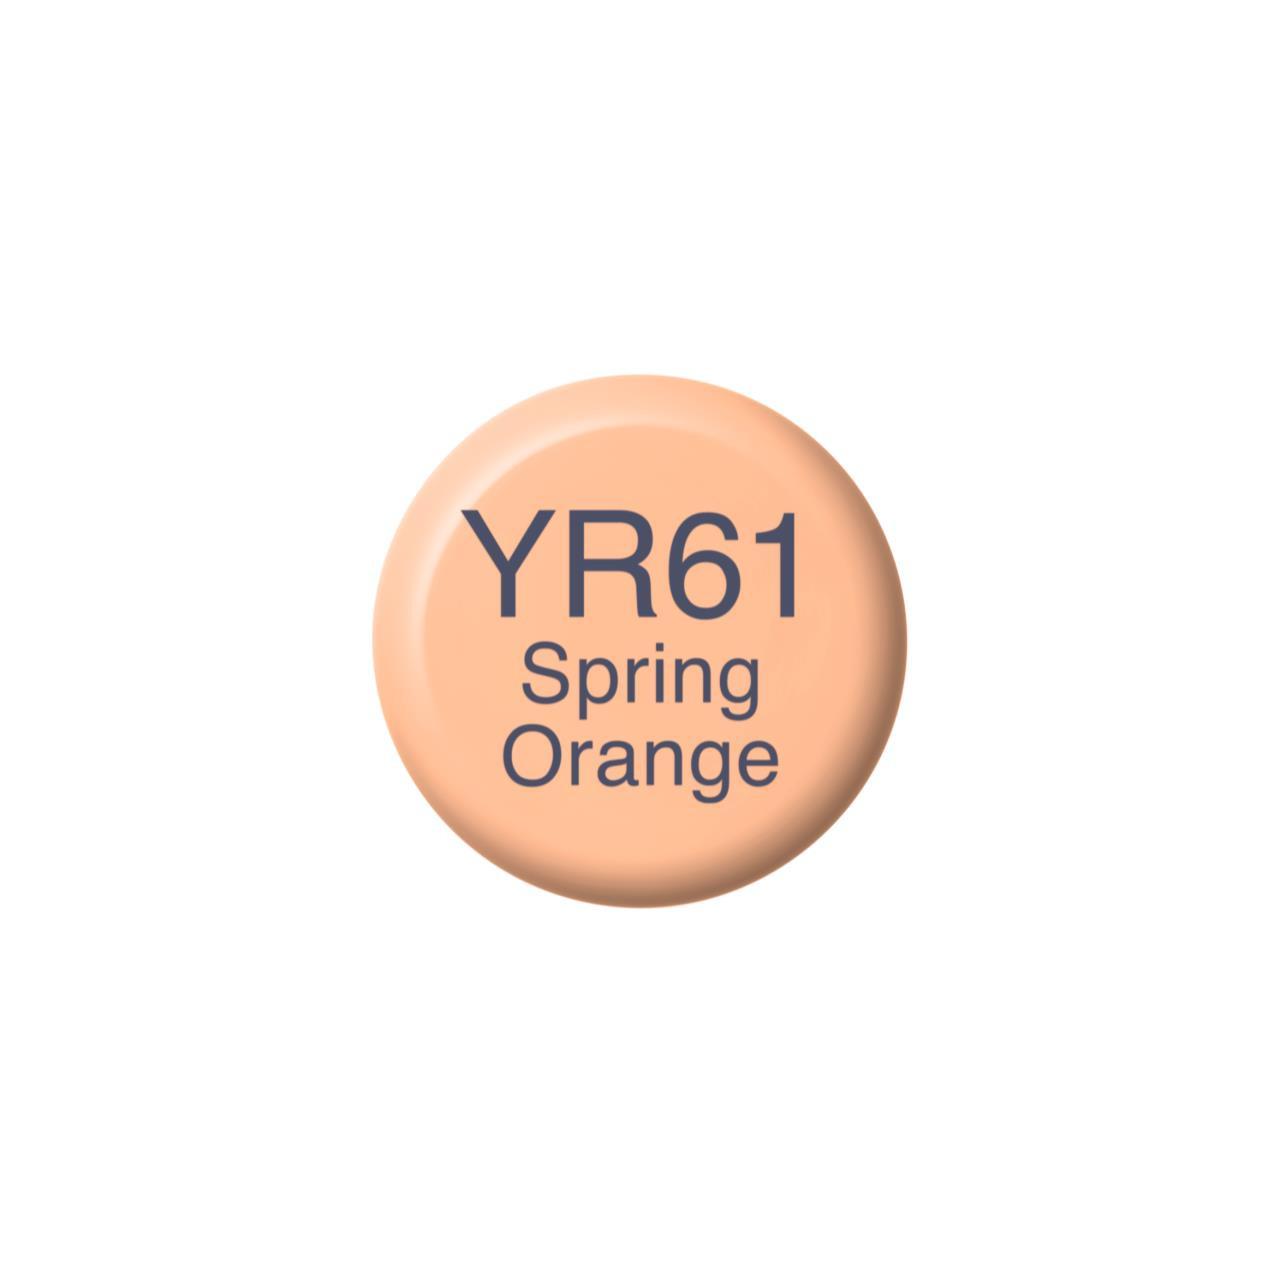 YR61 Spring Orange, Copic Ink - 4511338058770